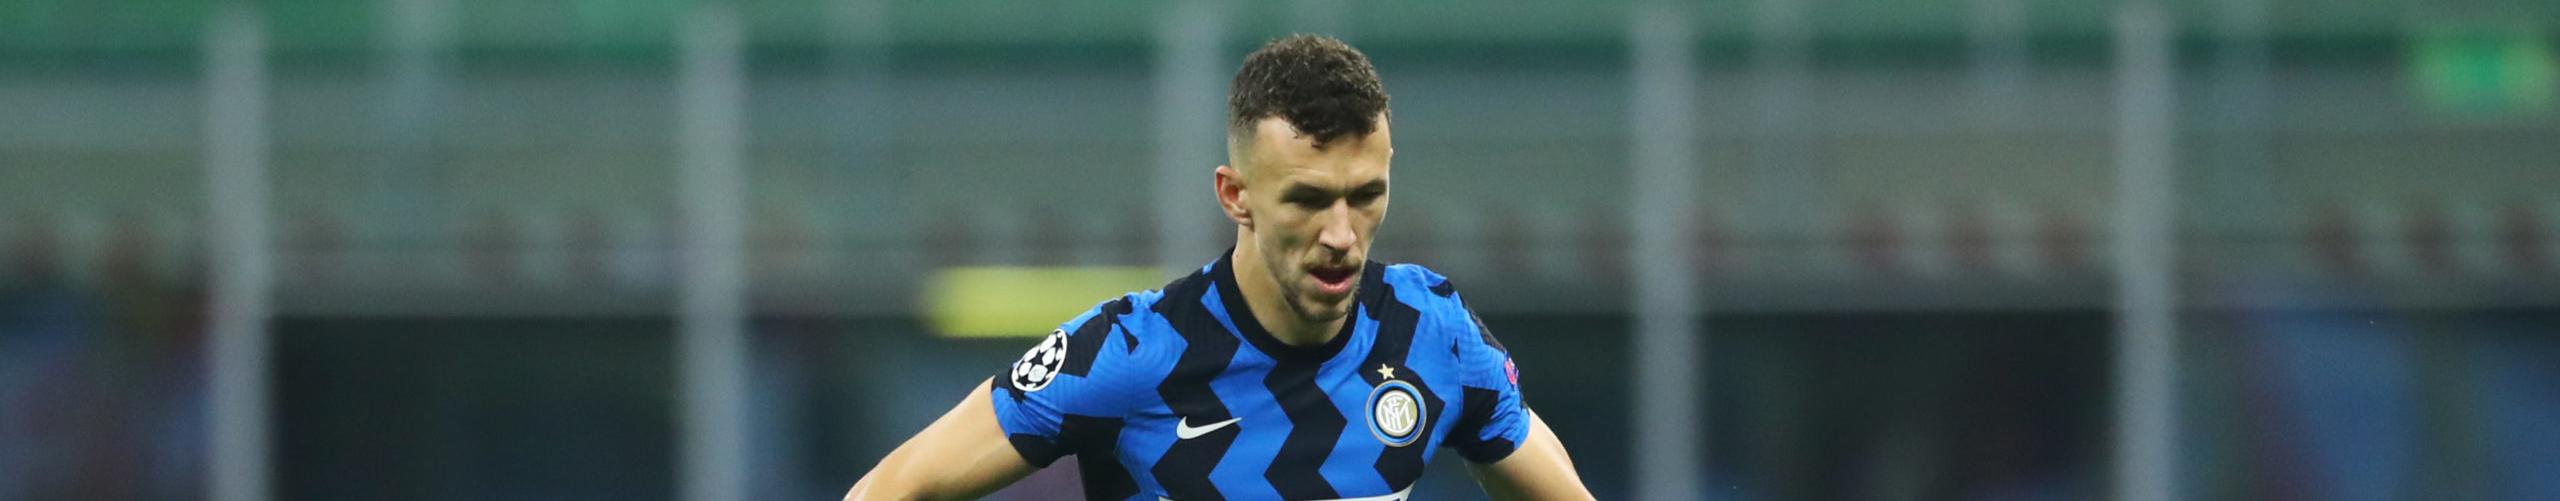 Pronostico Shakhtar Donetsk-Inter: Perisic o Young a sinistra – le ultimissime